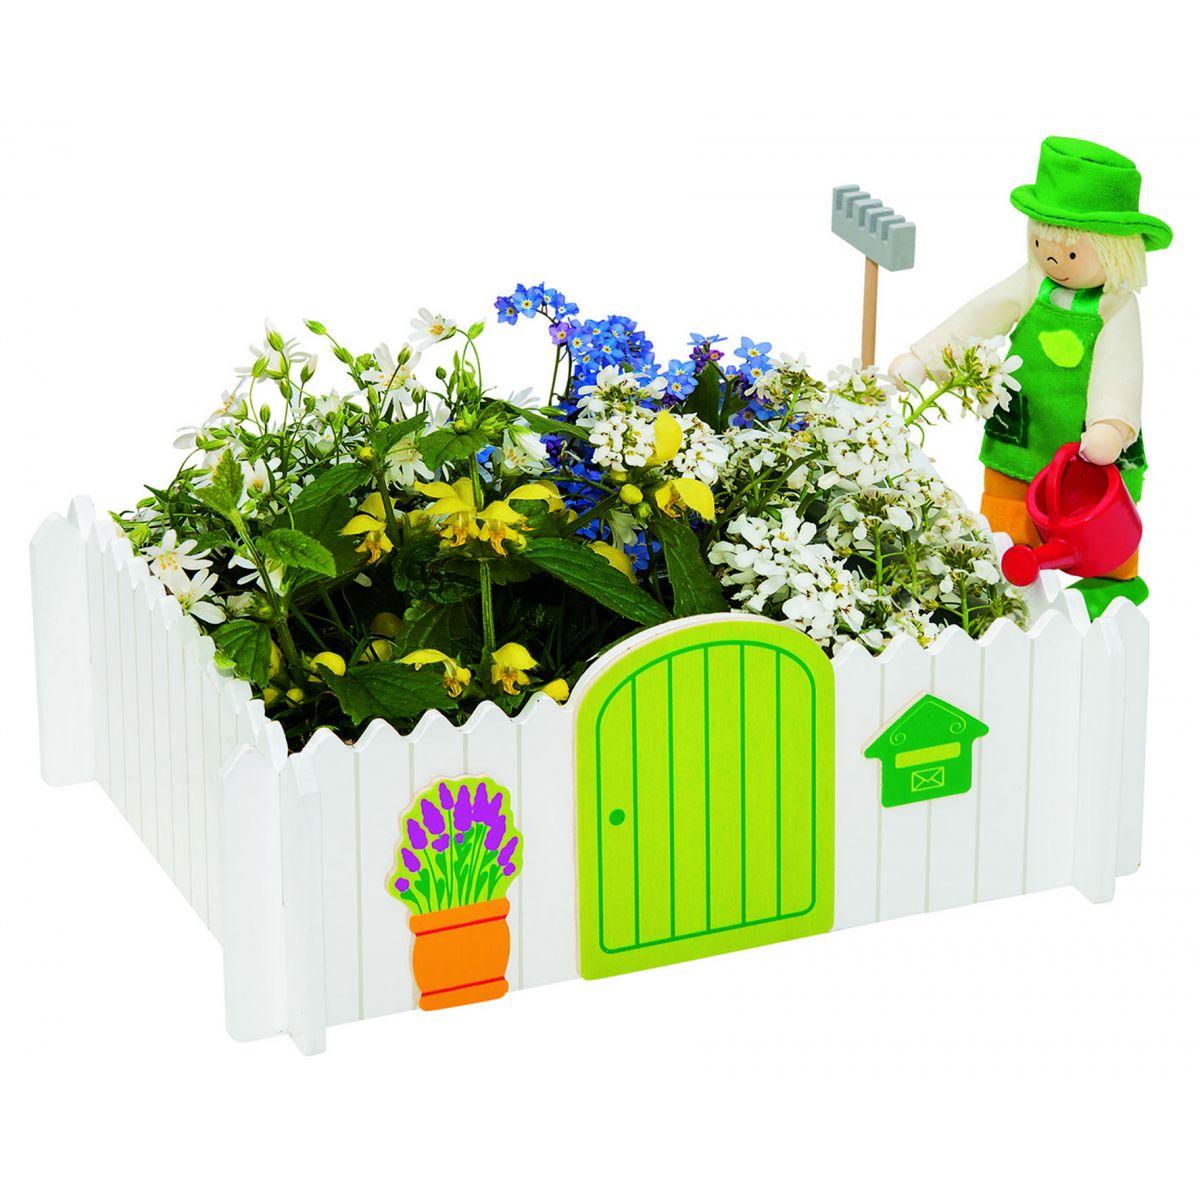 Accessoires jardinier for Jardin de jardiniers